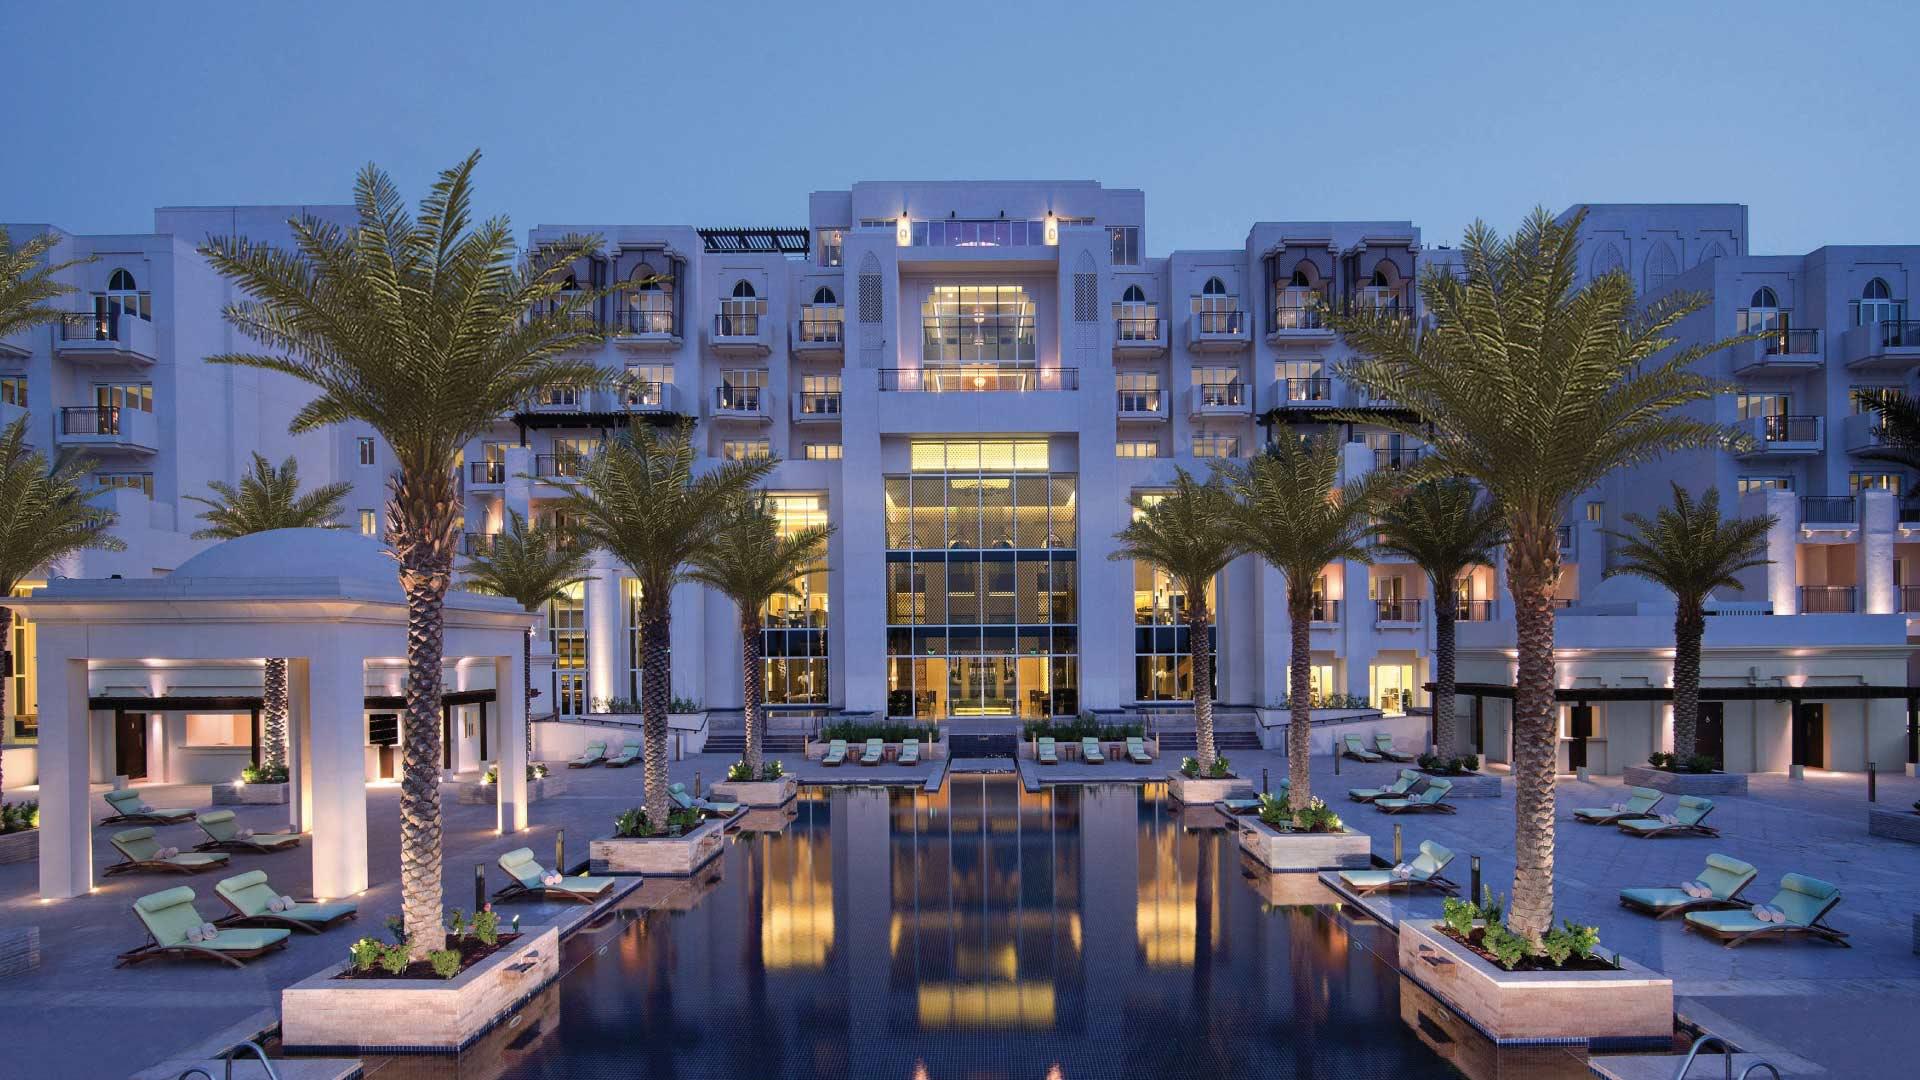 5 Sterne Hotels In Abu Dhabi Eastern Mangroves Hotel Amp Spa By